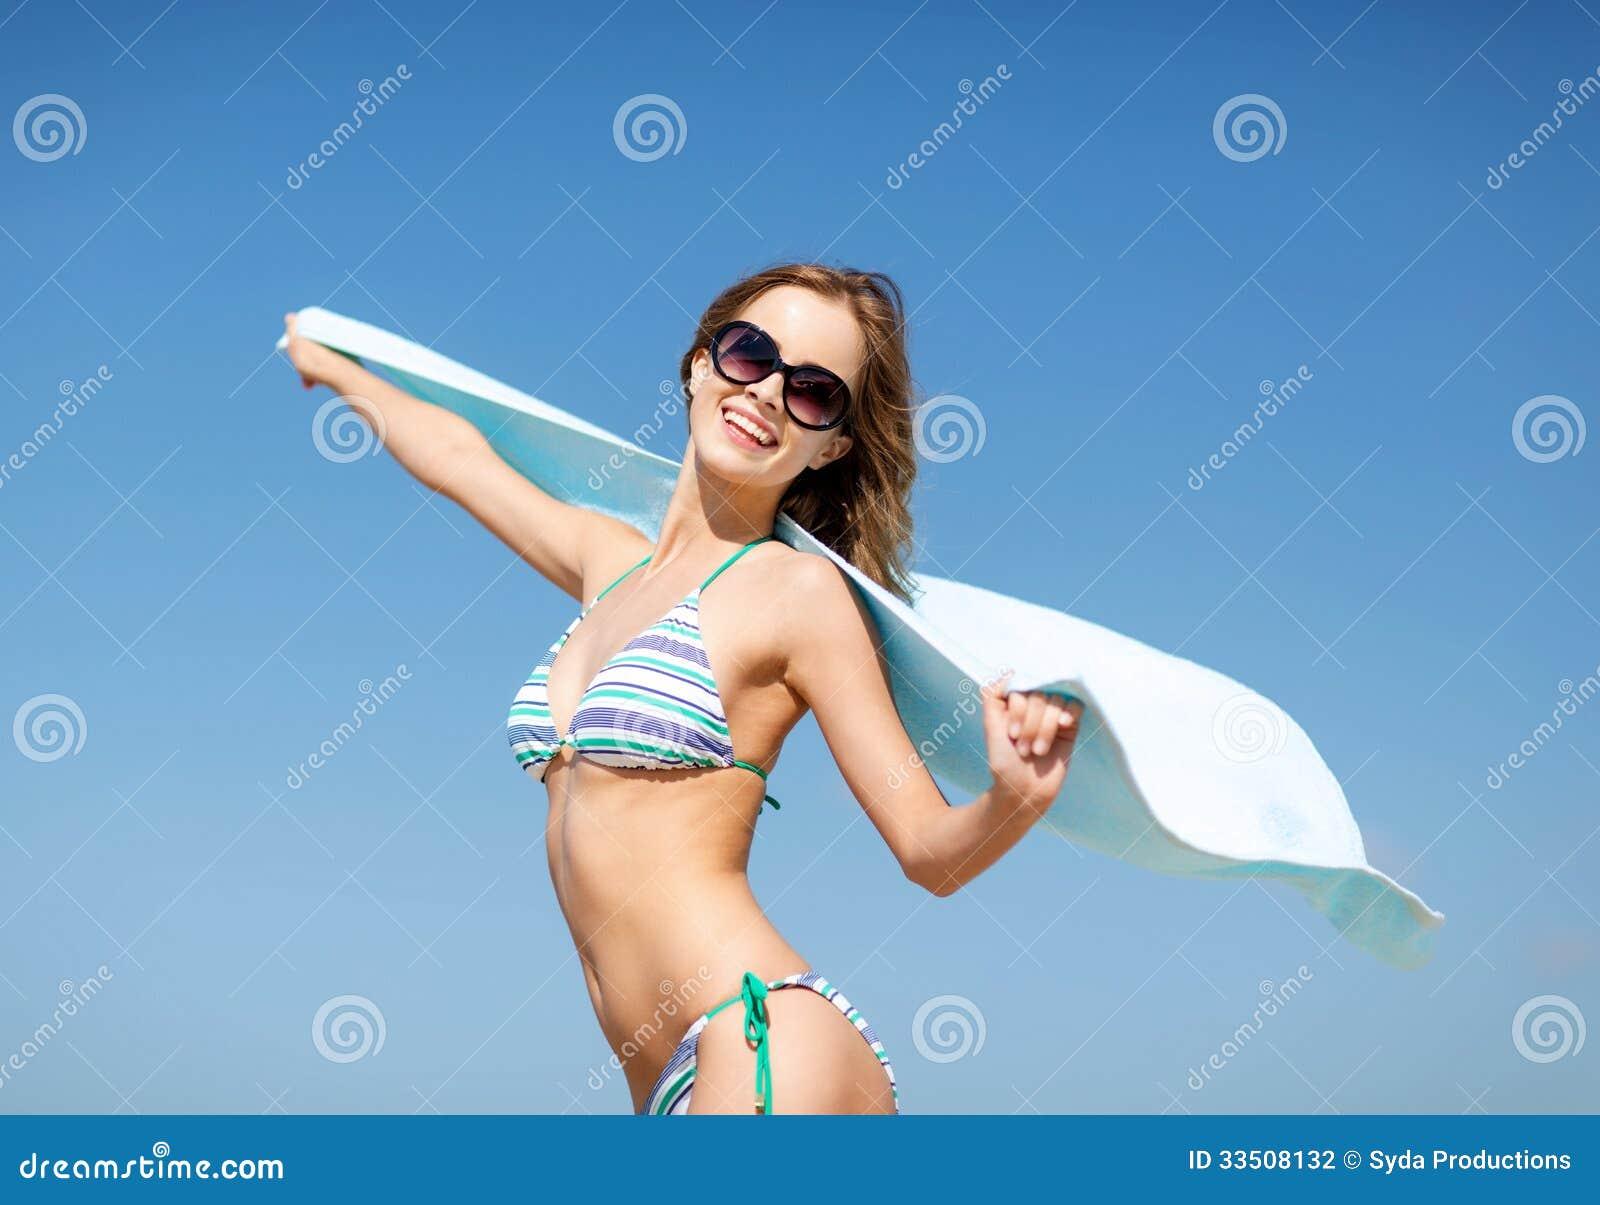 Bikini beach productions directly